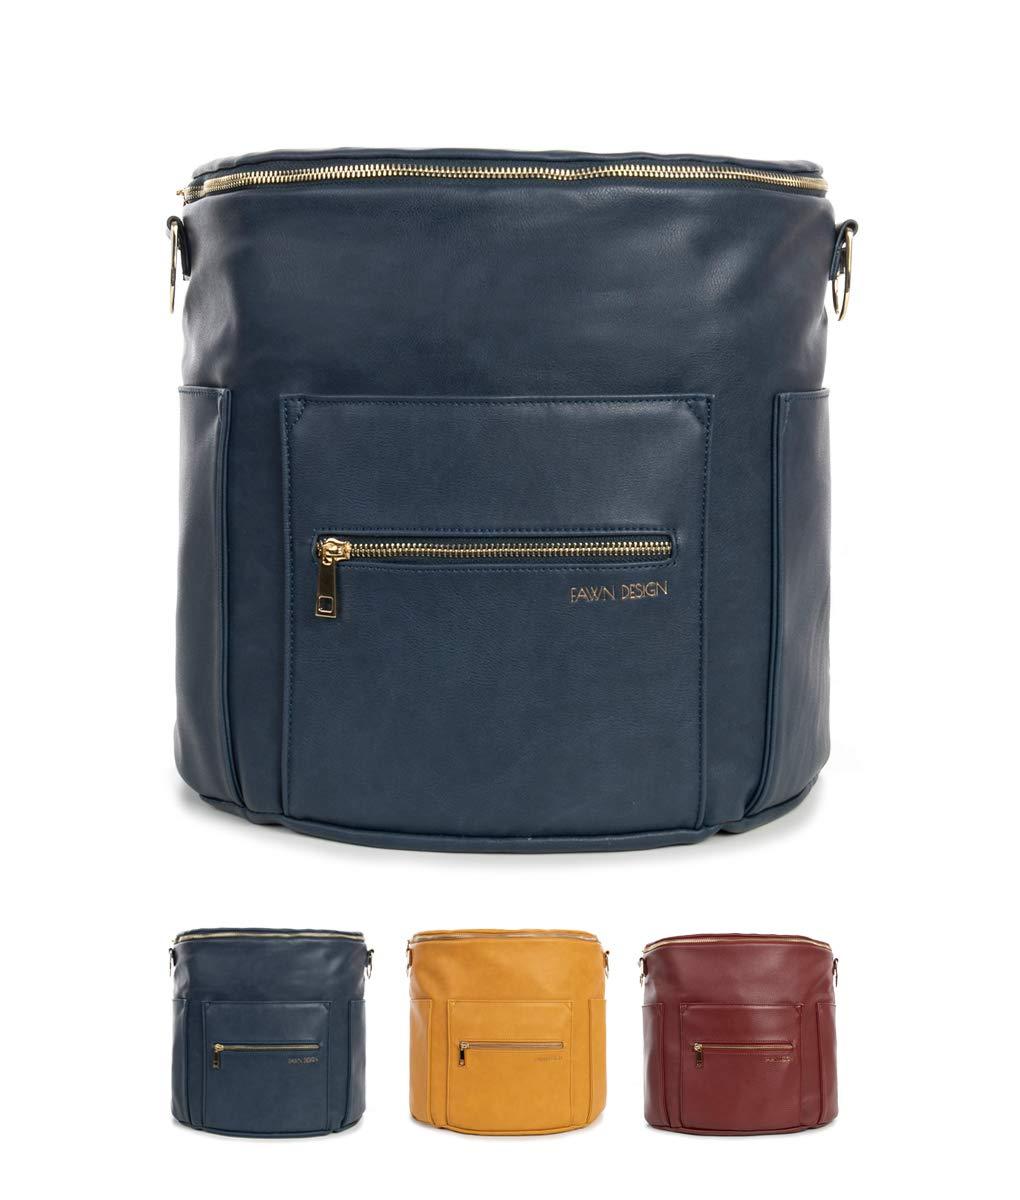 Fawn Design Premium Vegan Leather Diaper Bag and Backpack (Navy 2.0)